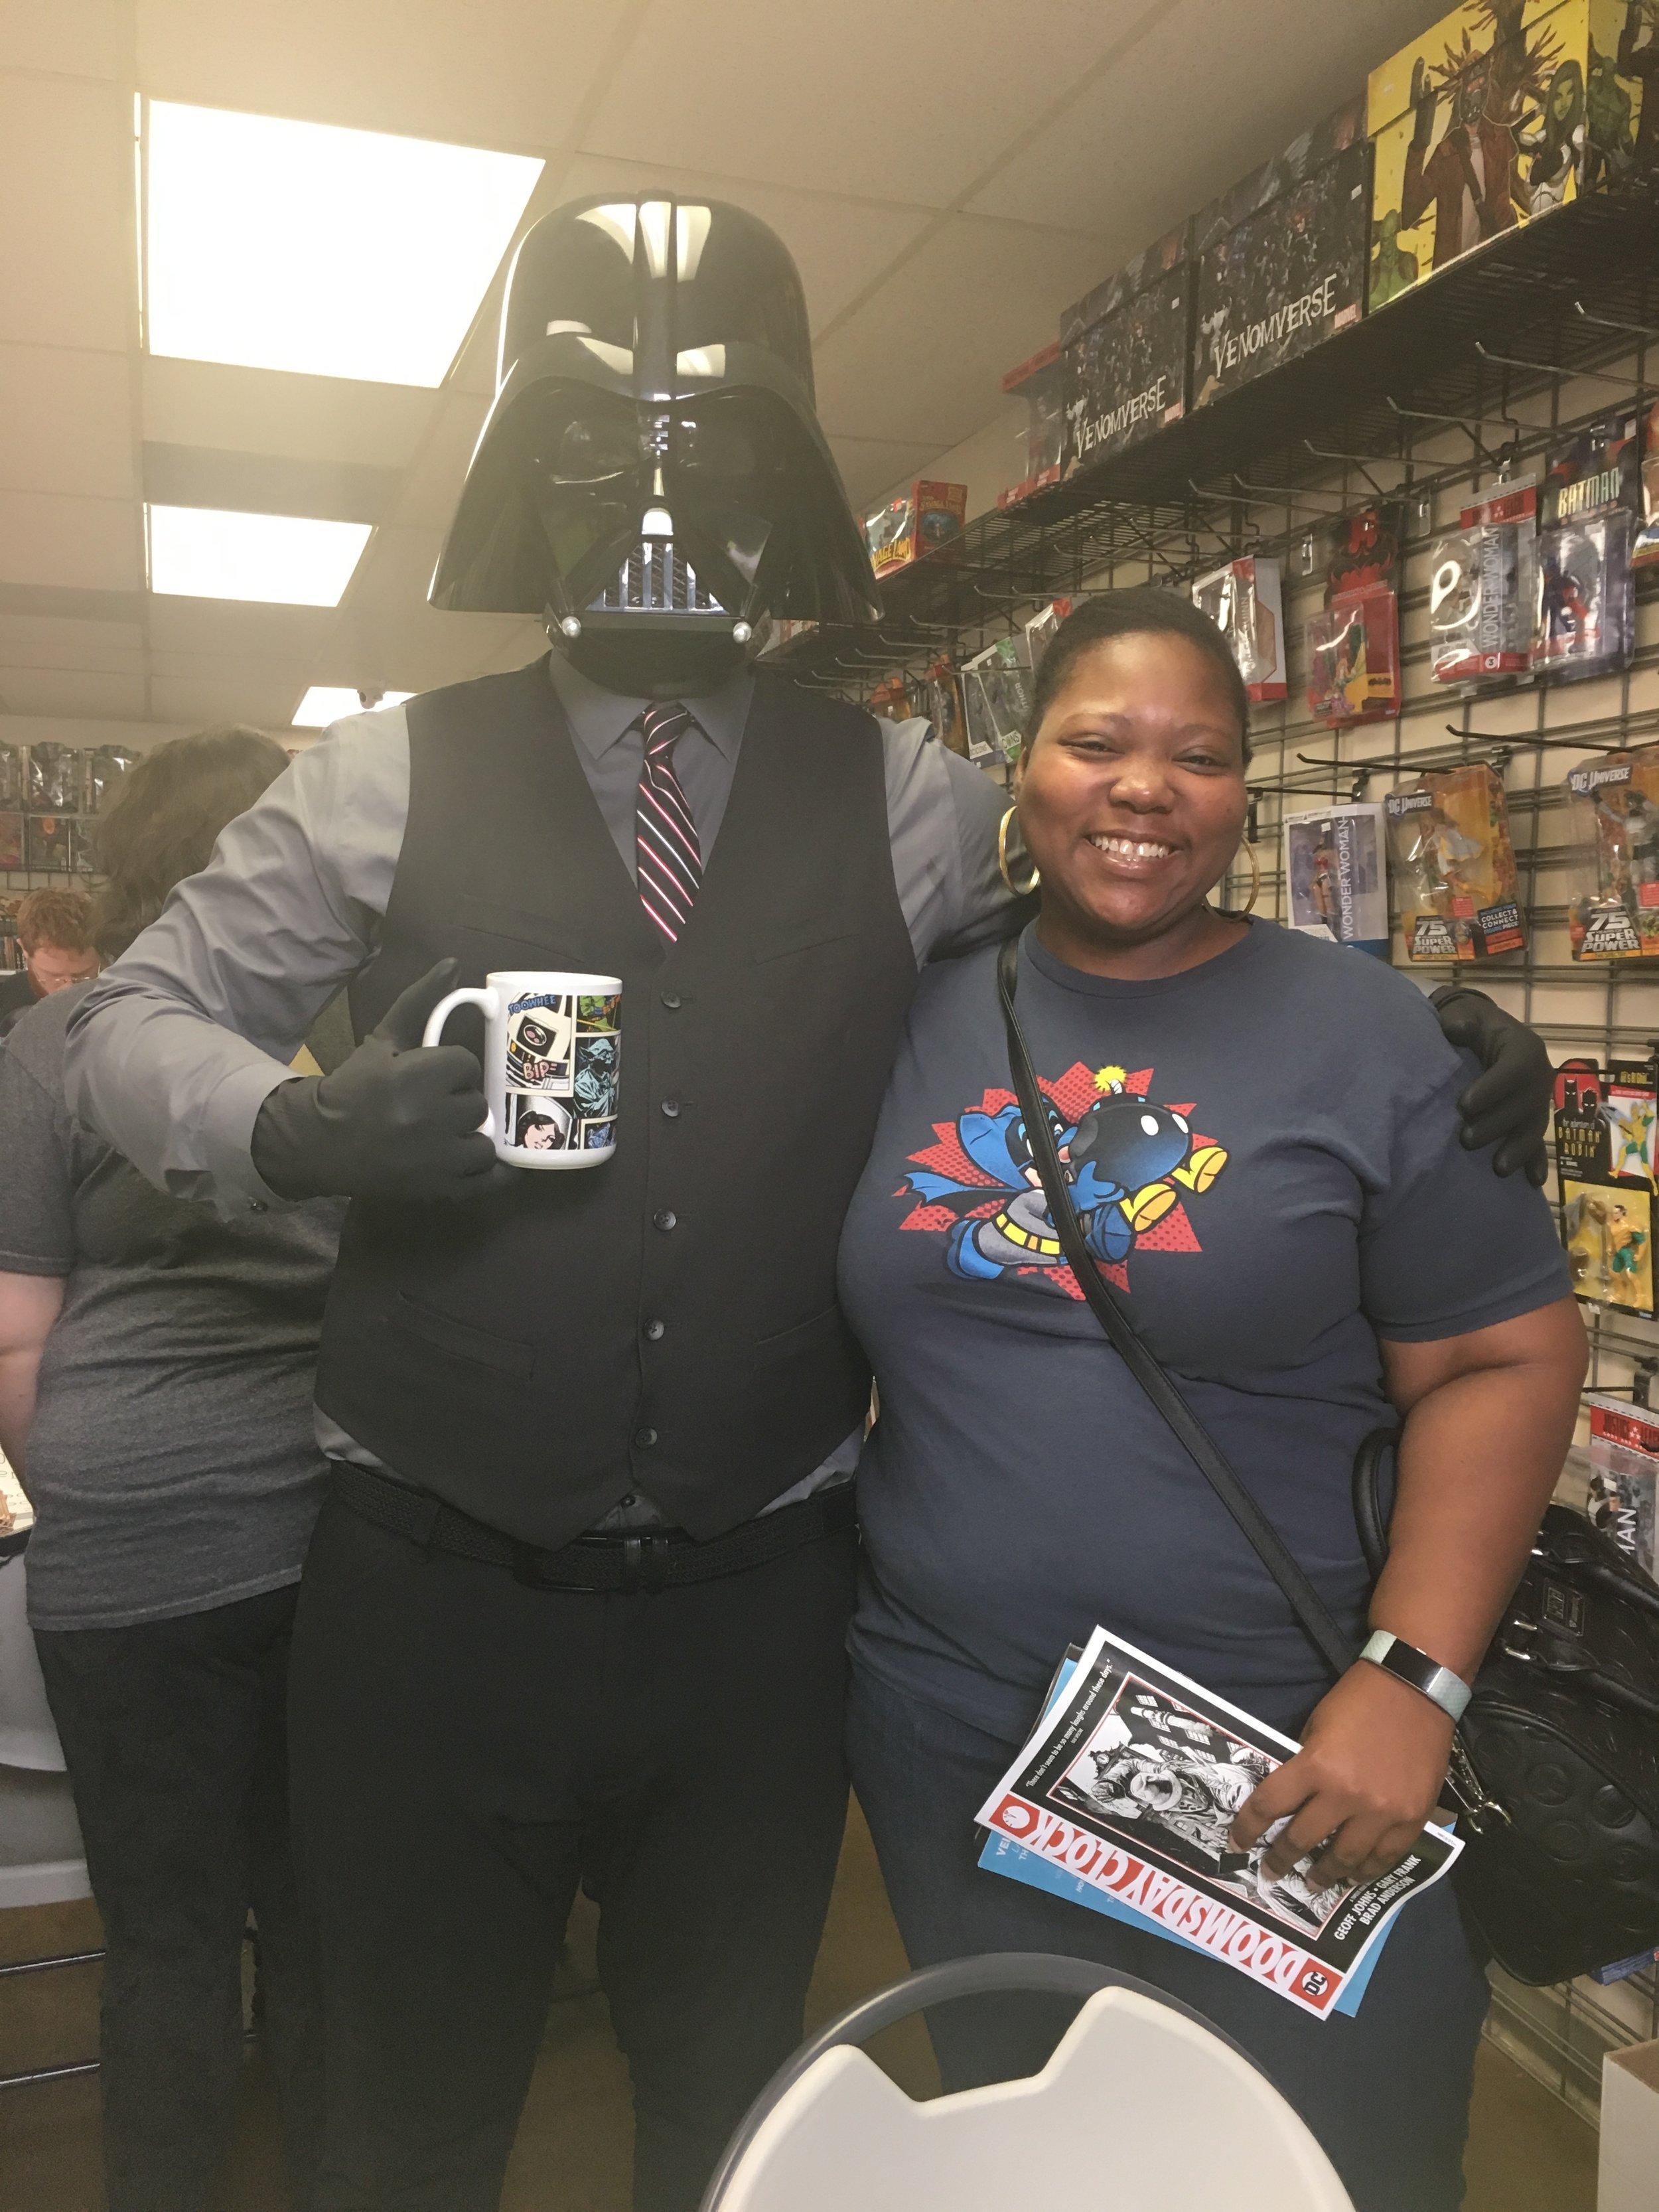 Me and Darth Vader at Free Comic Book Day. Lol